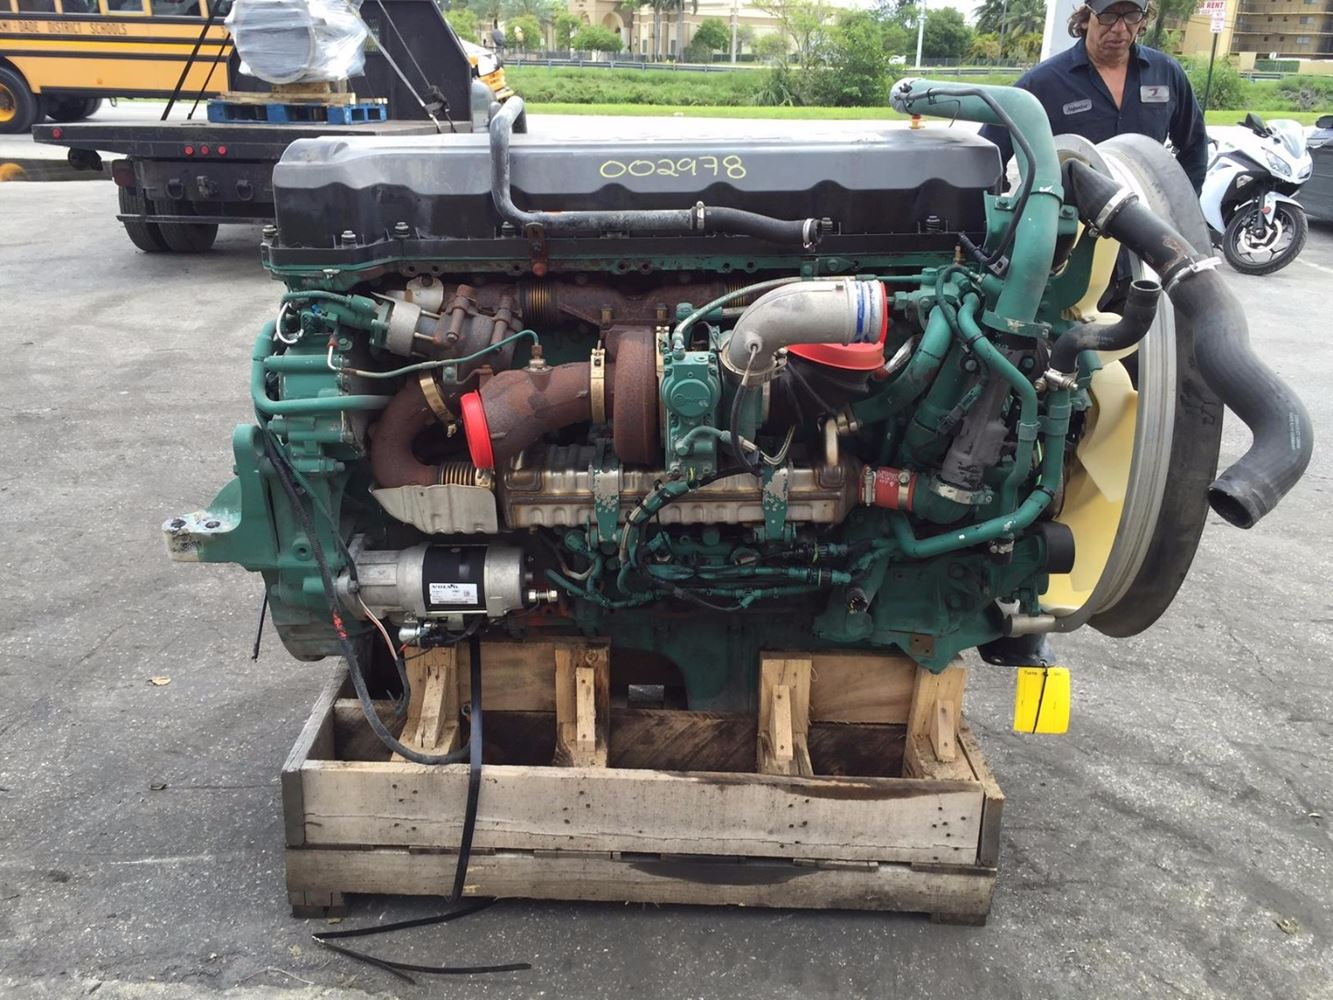 Volvo D13 (Stock #002978) | Engine ys | TPI